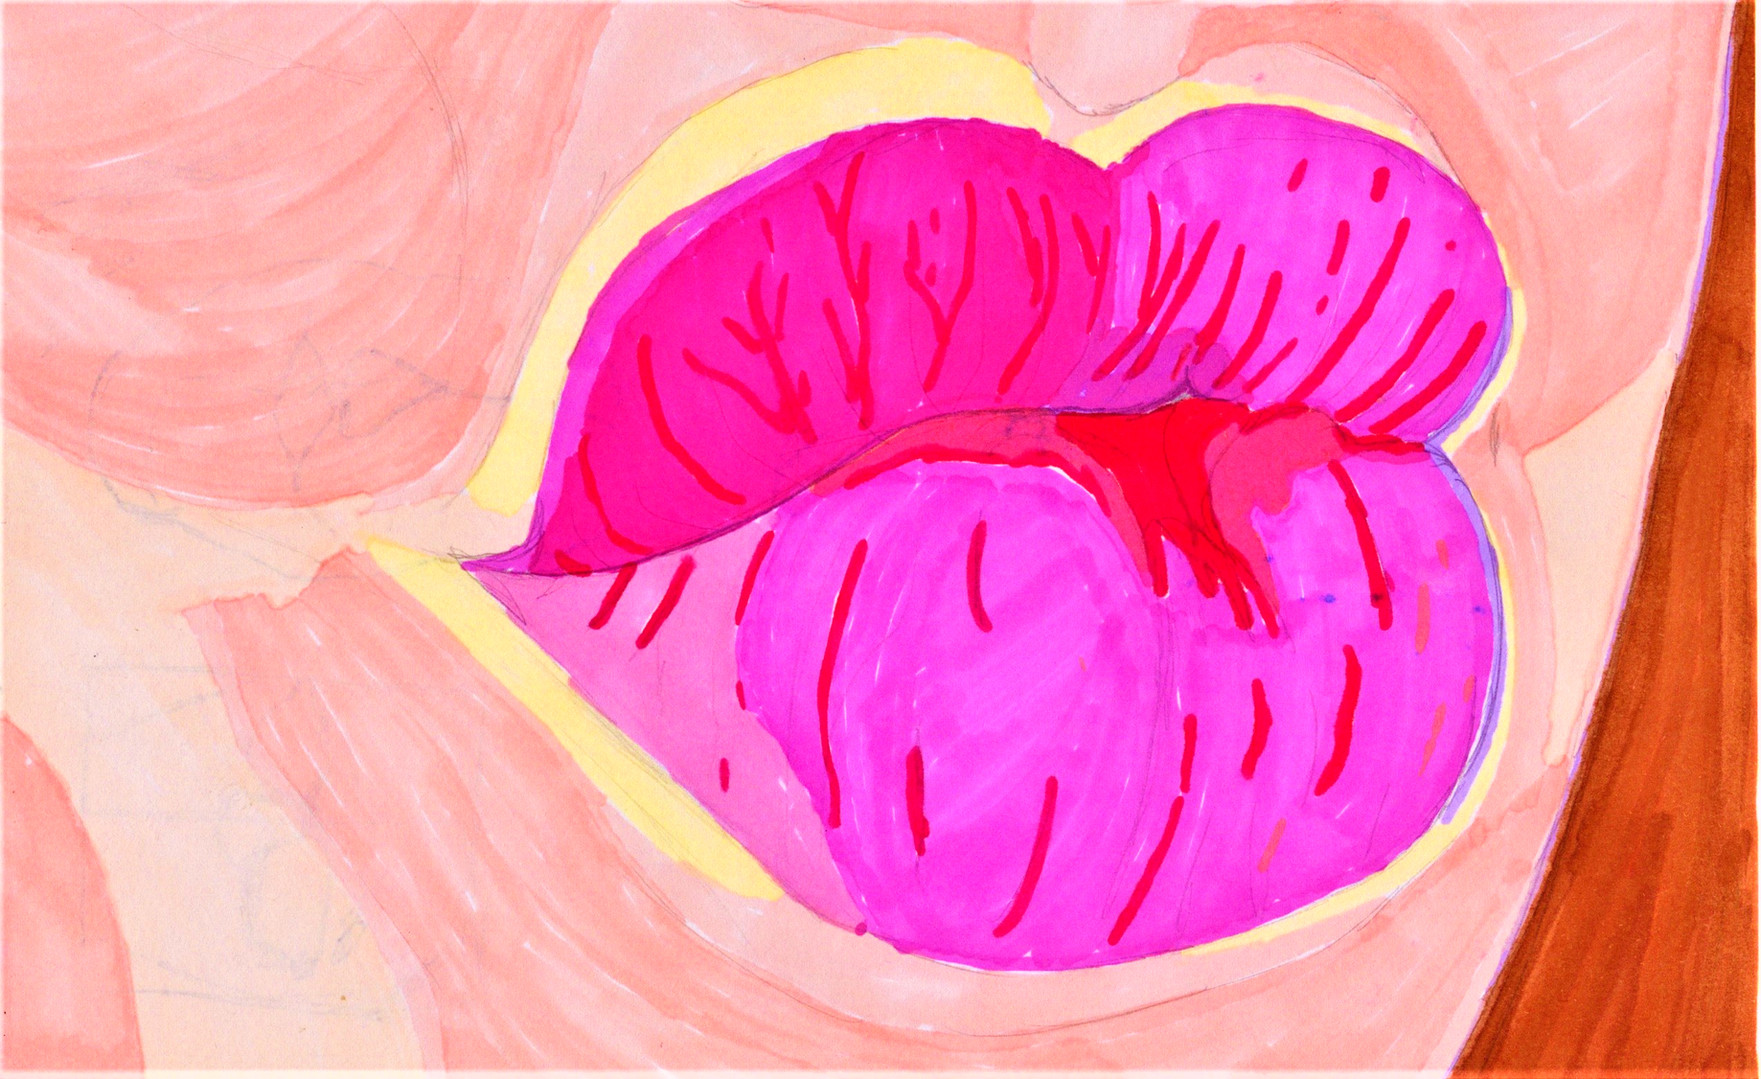 lips .jpg